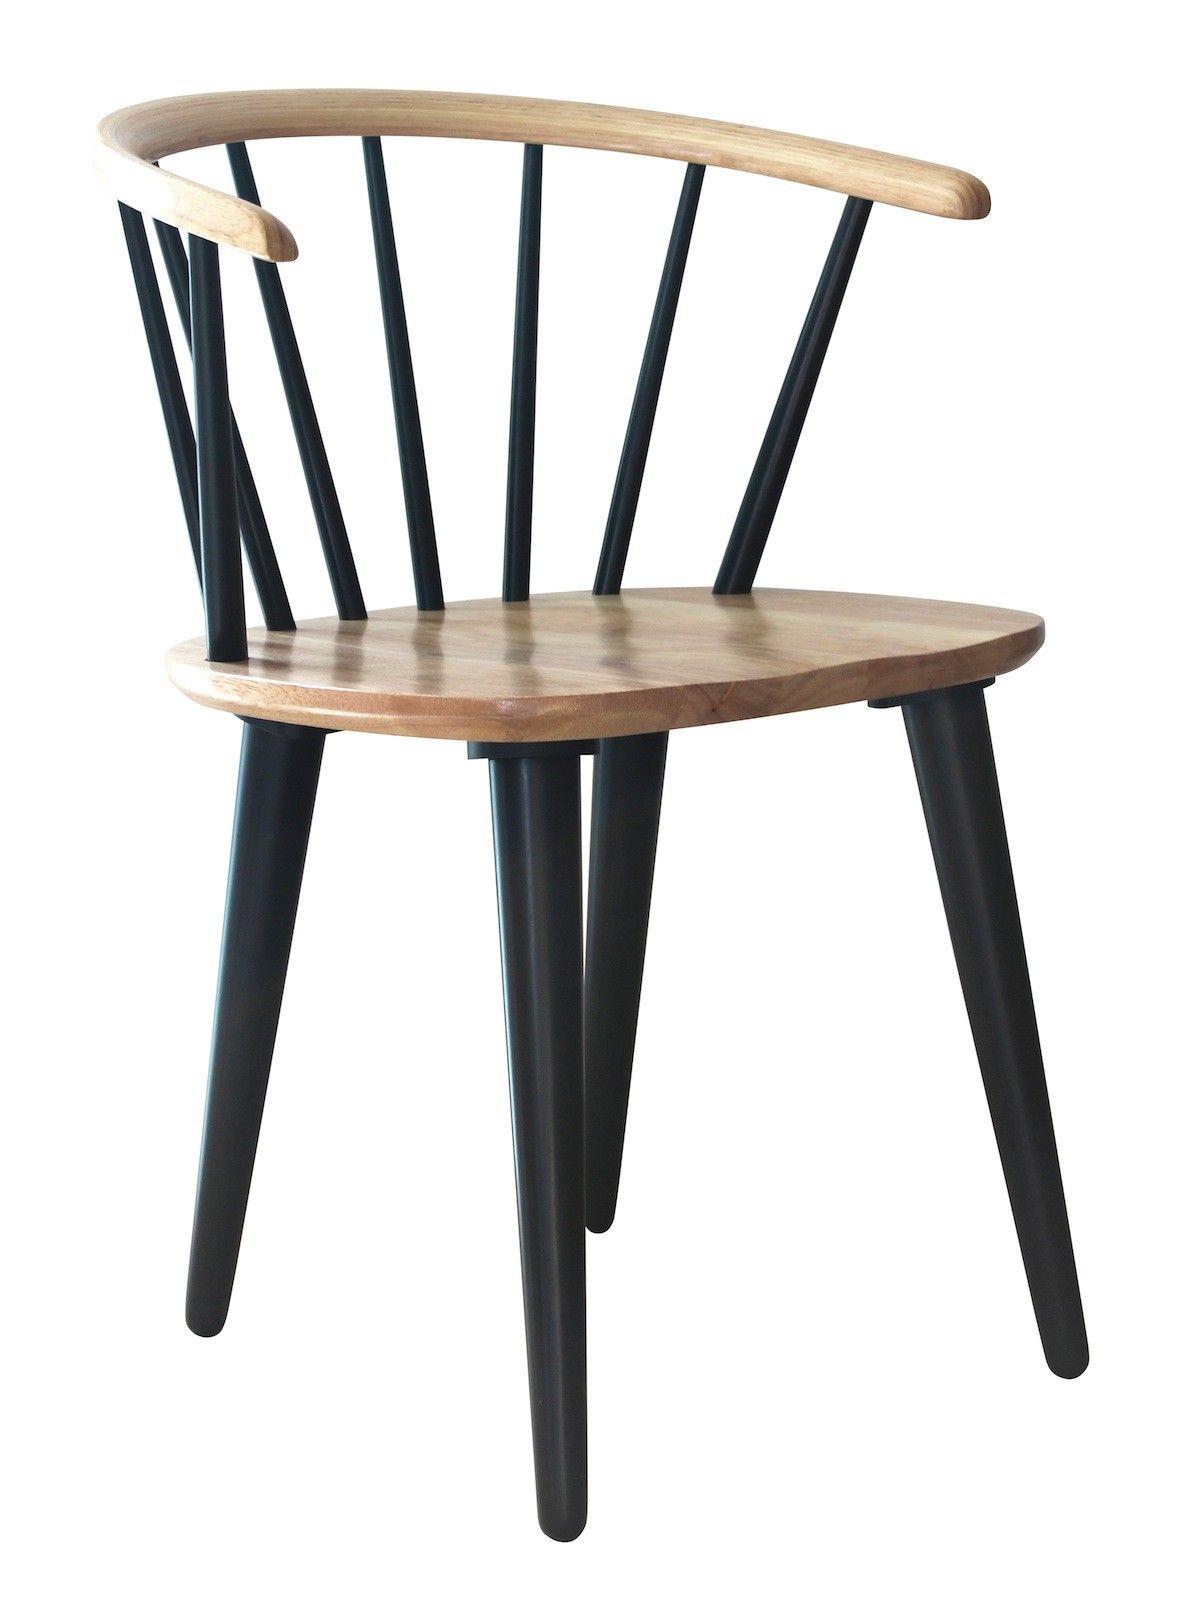 Holzstuhl stuhl klassiker aosta laden chair dining for Stuhl klassiker